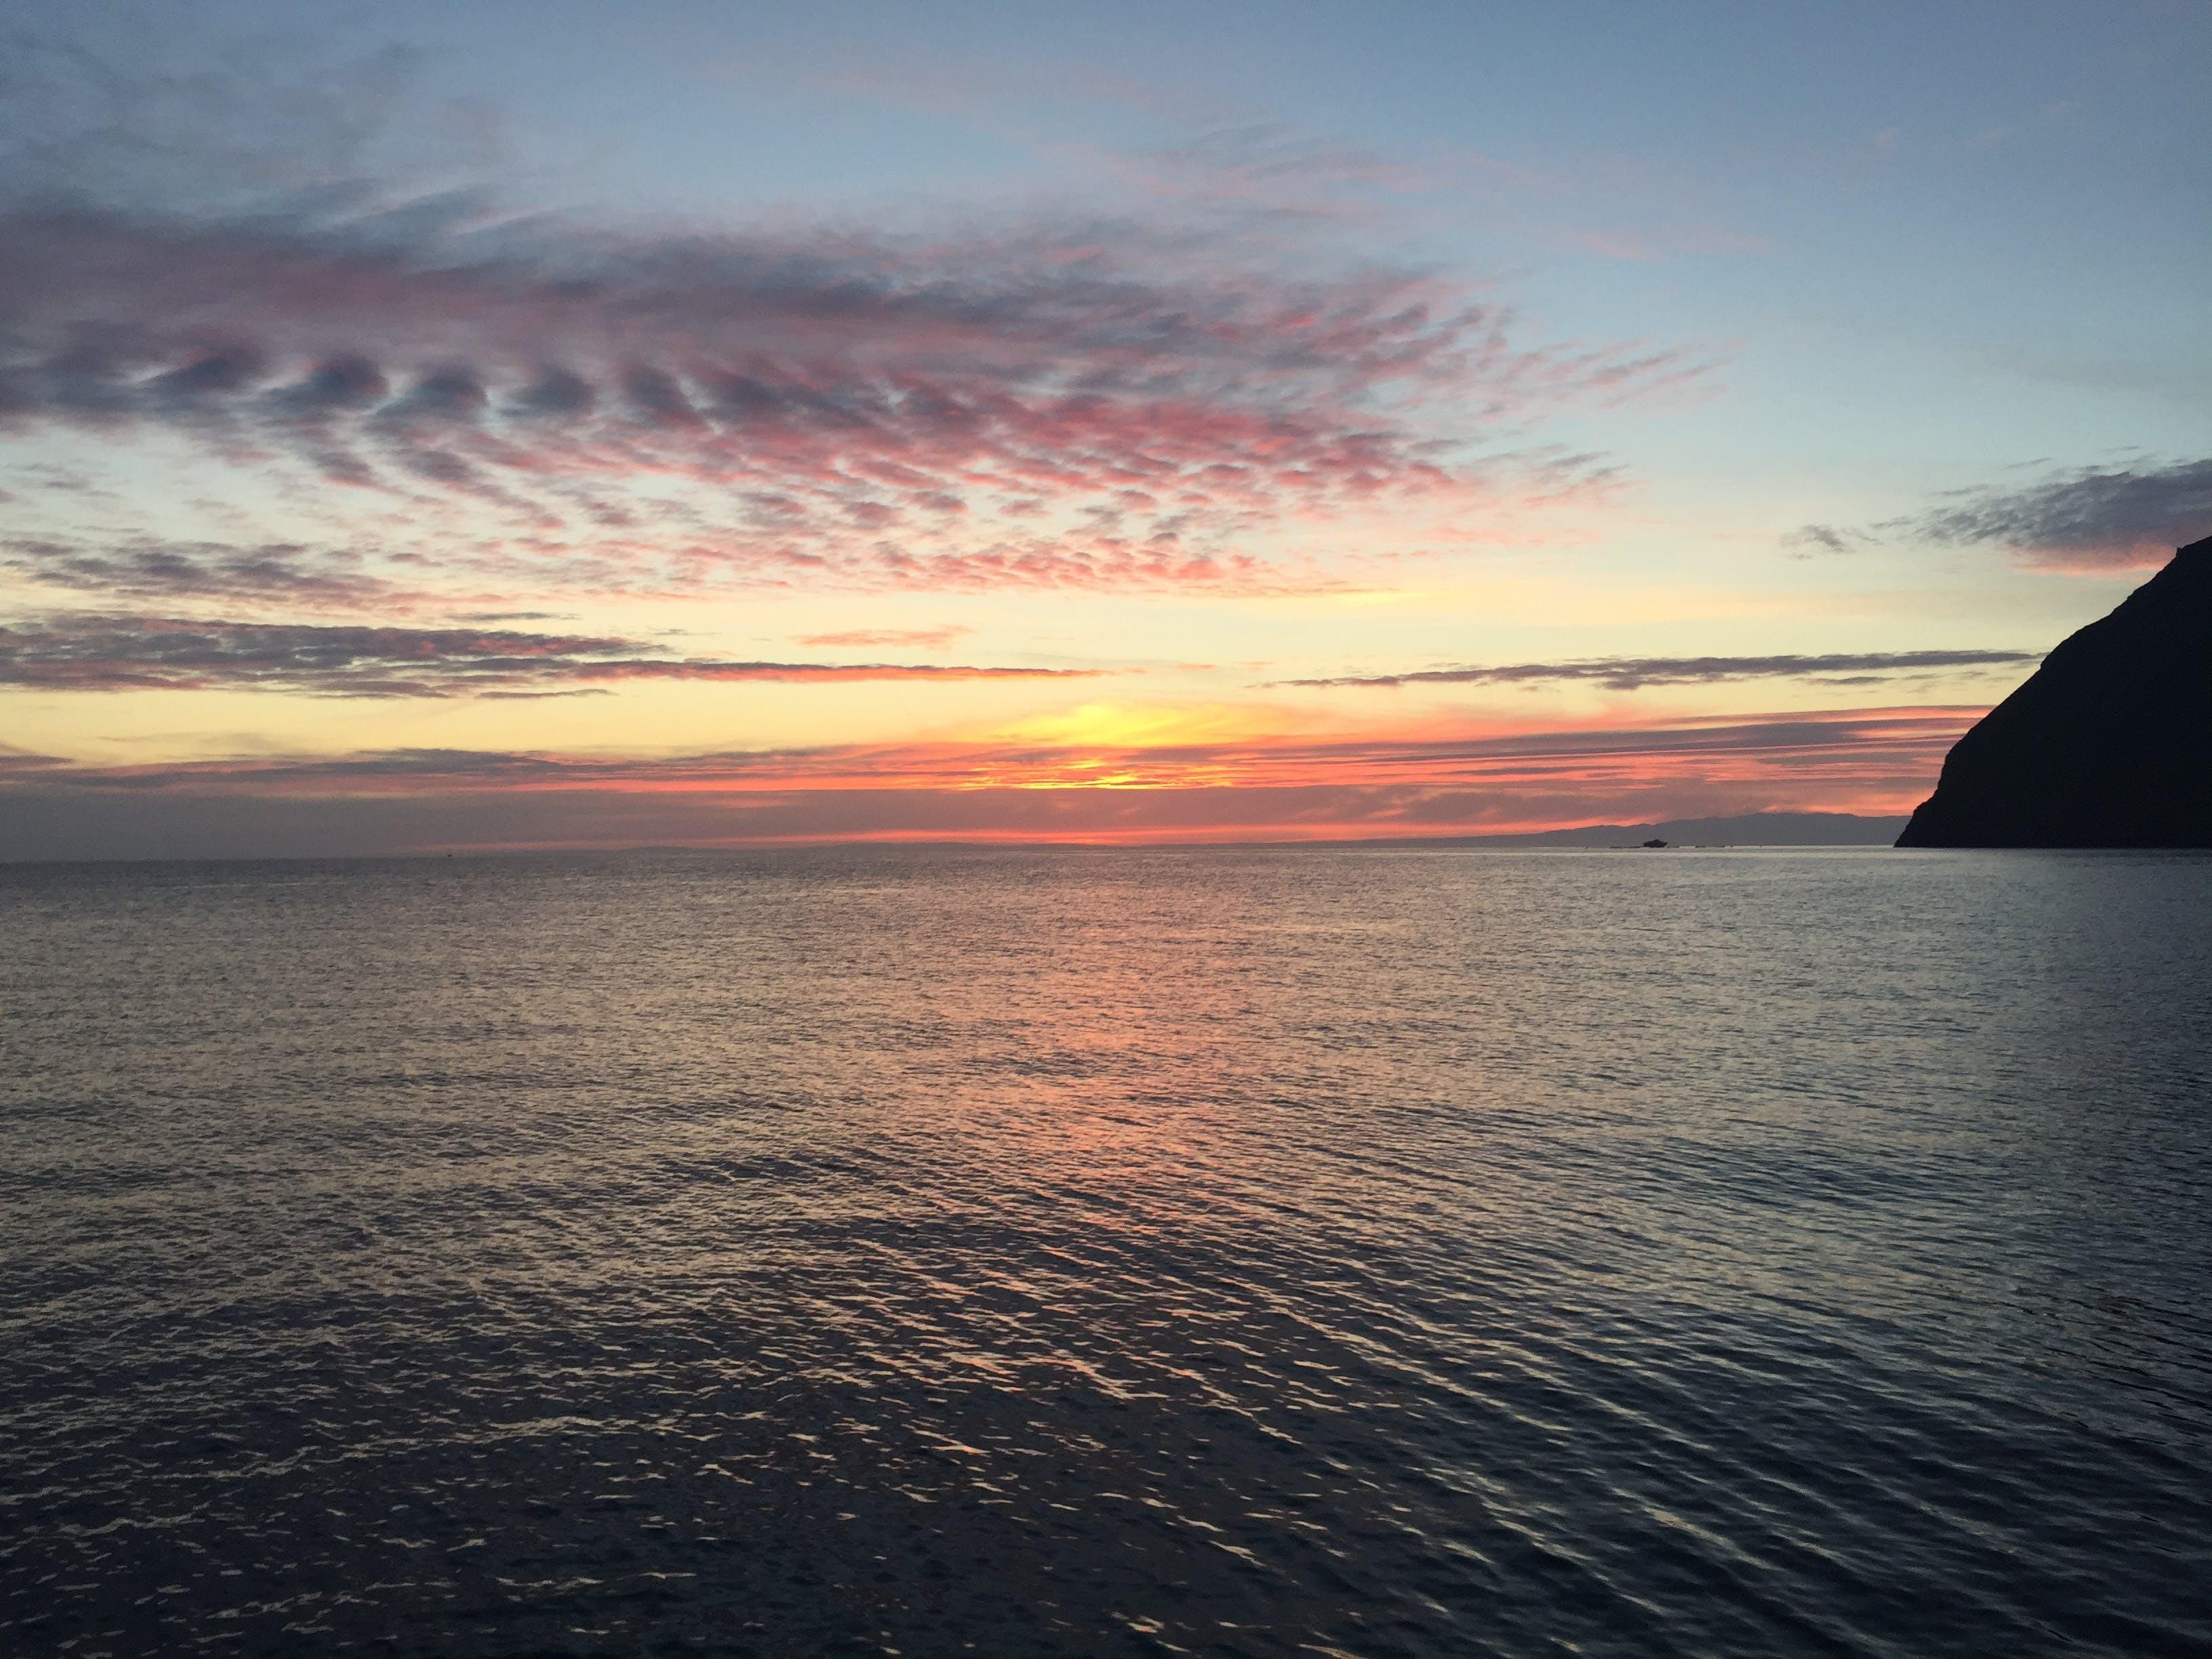 Free stock photo of beach, beach break, cloud formation, morning sun